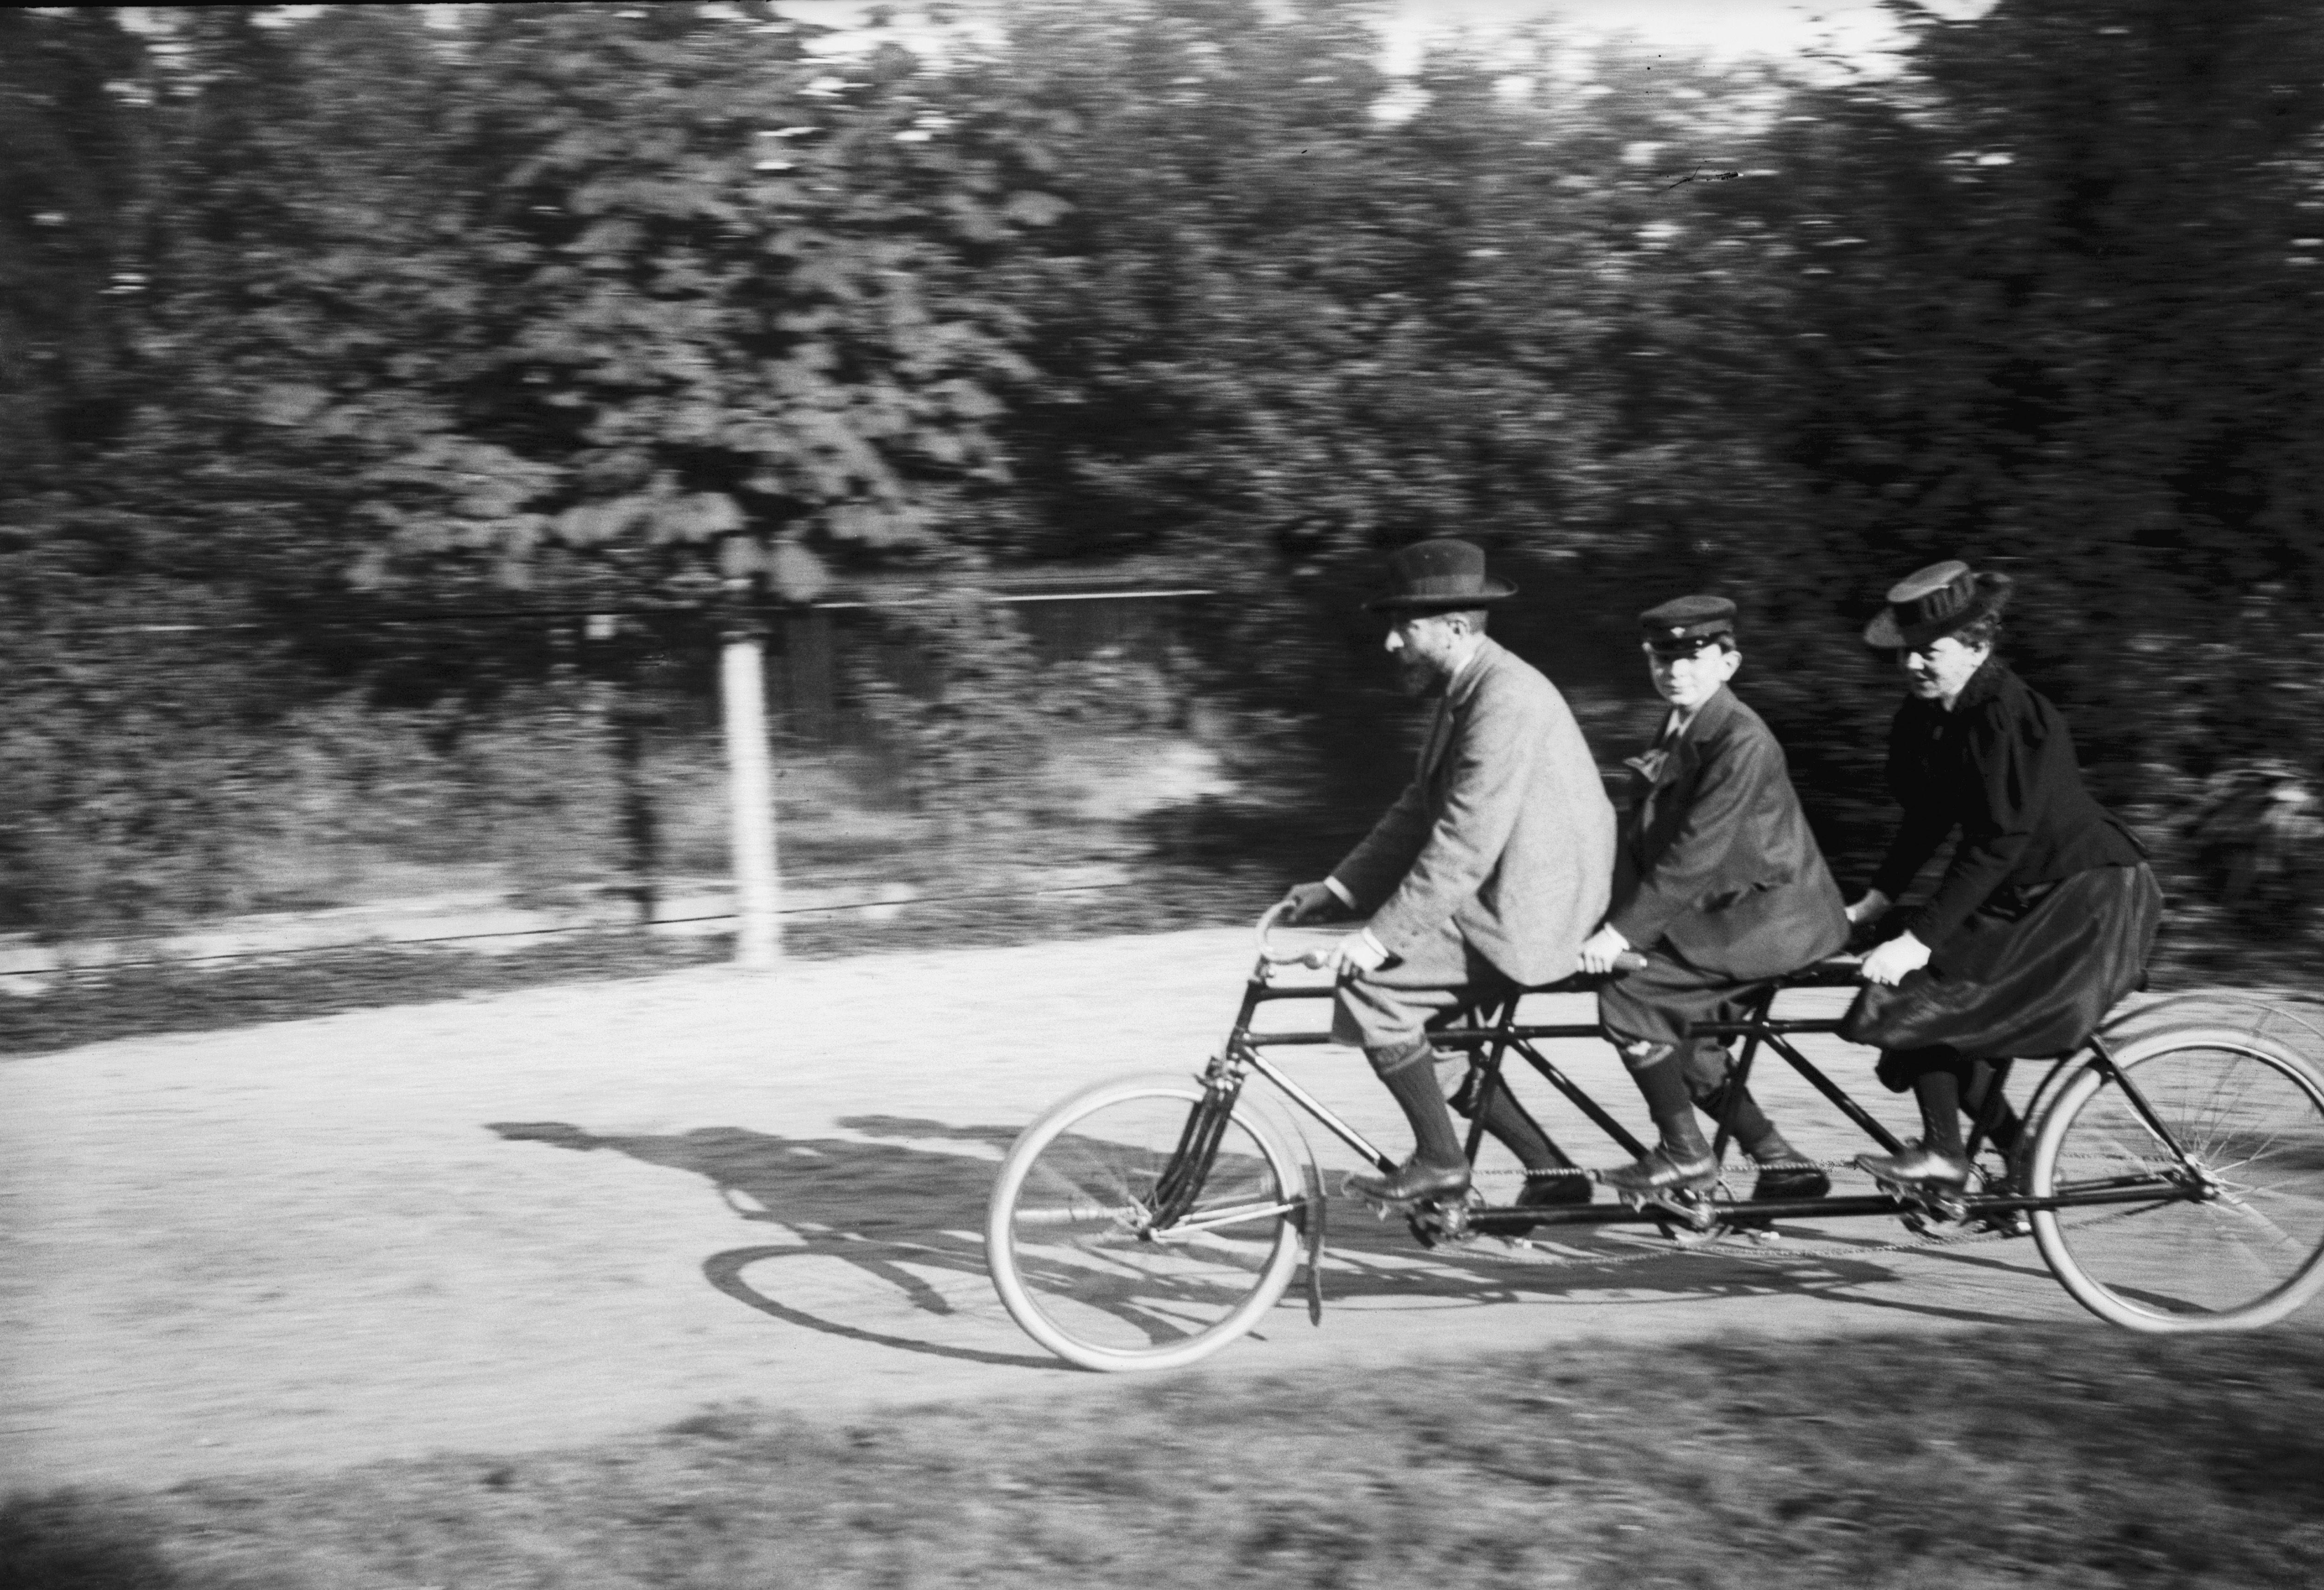 Family Group On Tandem Bike